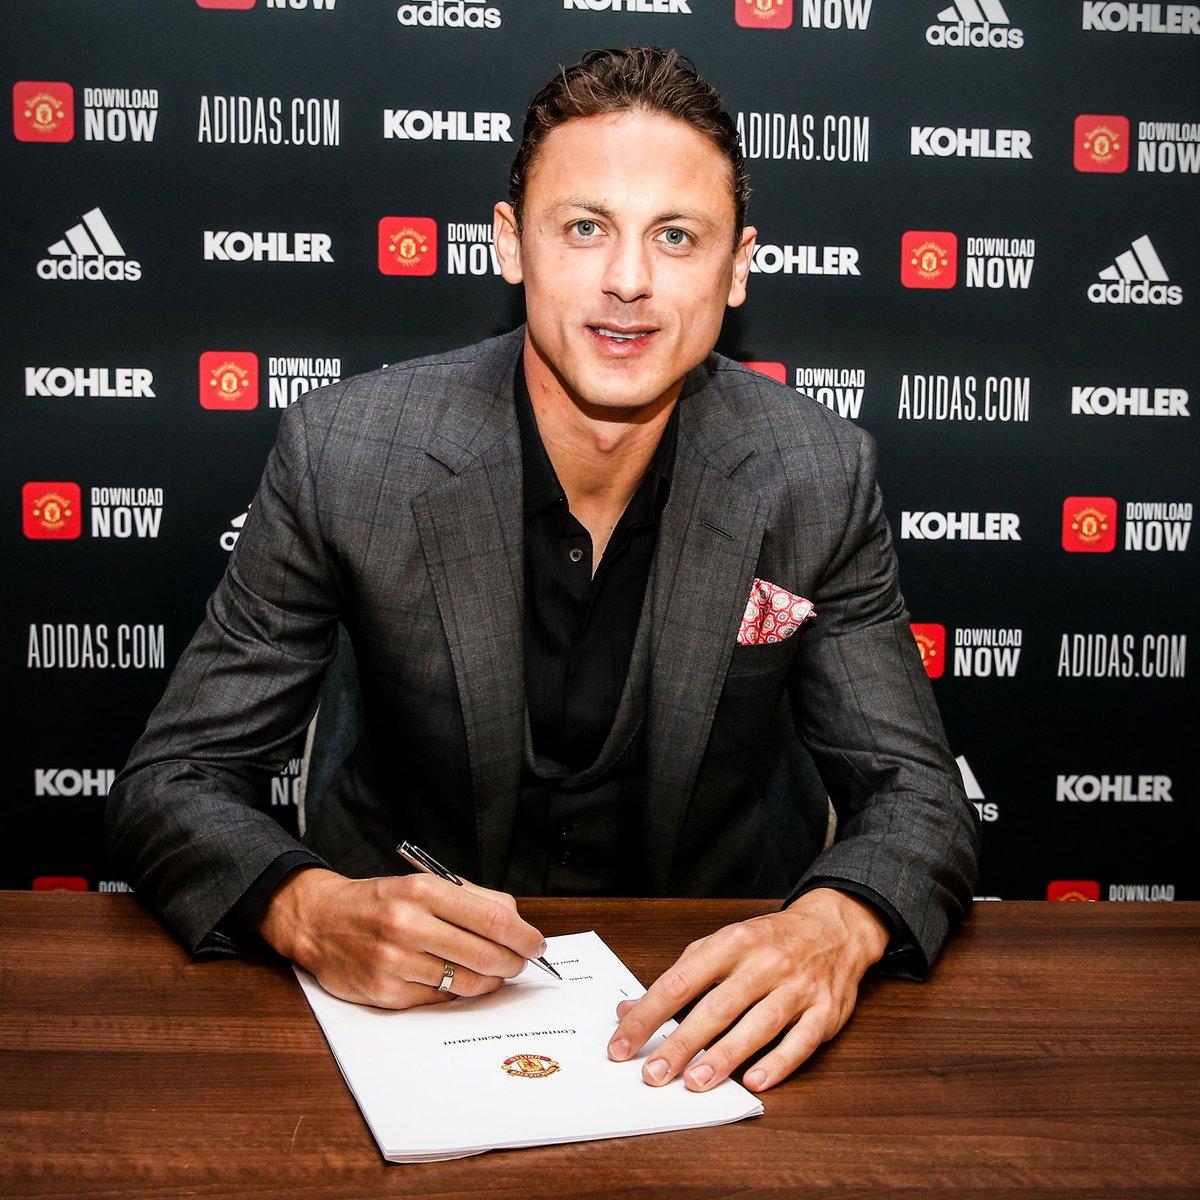 OFFICIAL: Nemanja Matic has renewed with Manchester United until 2023 ✍️ https://t.co/DdTuGUx0jz